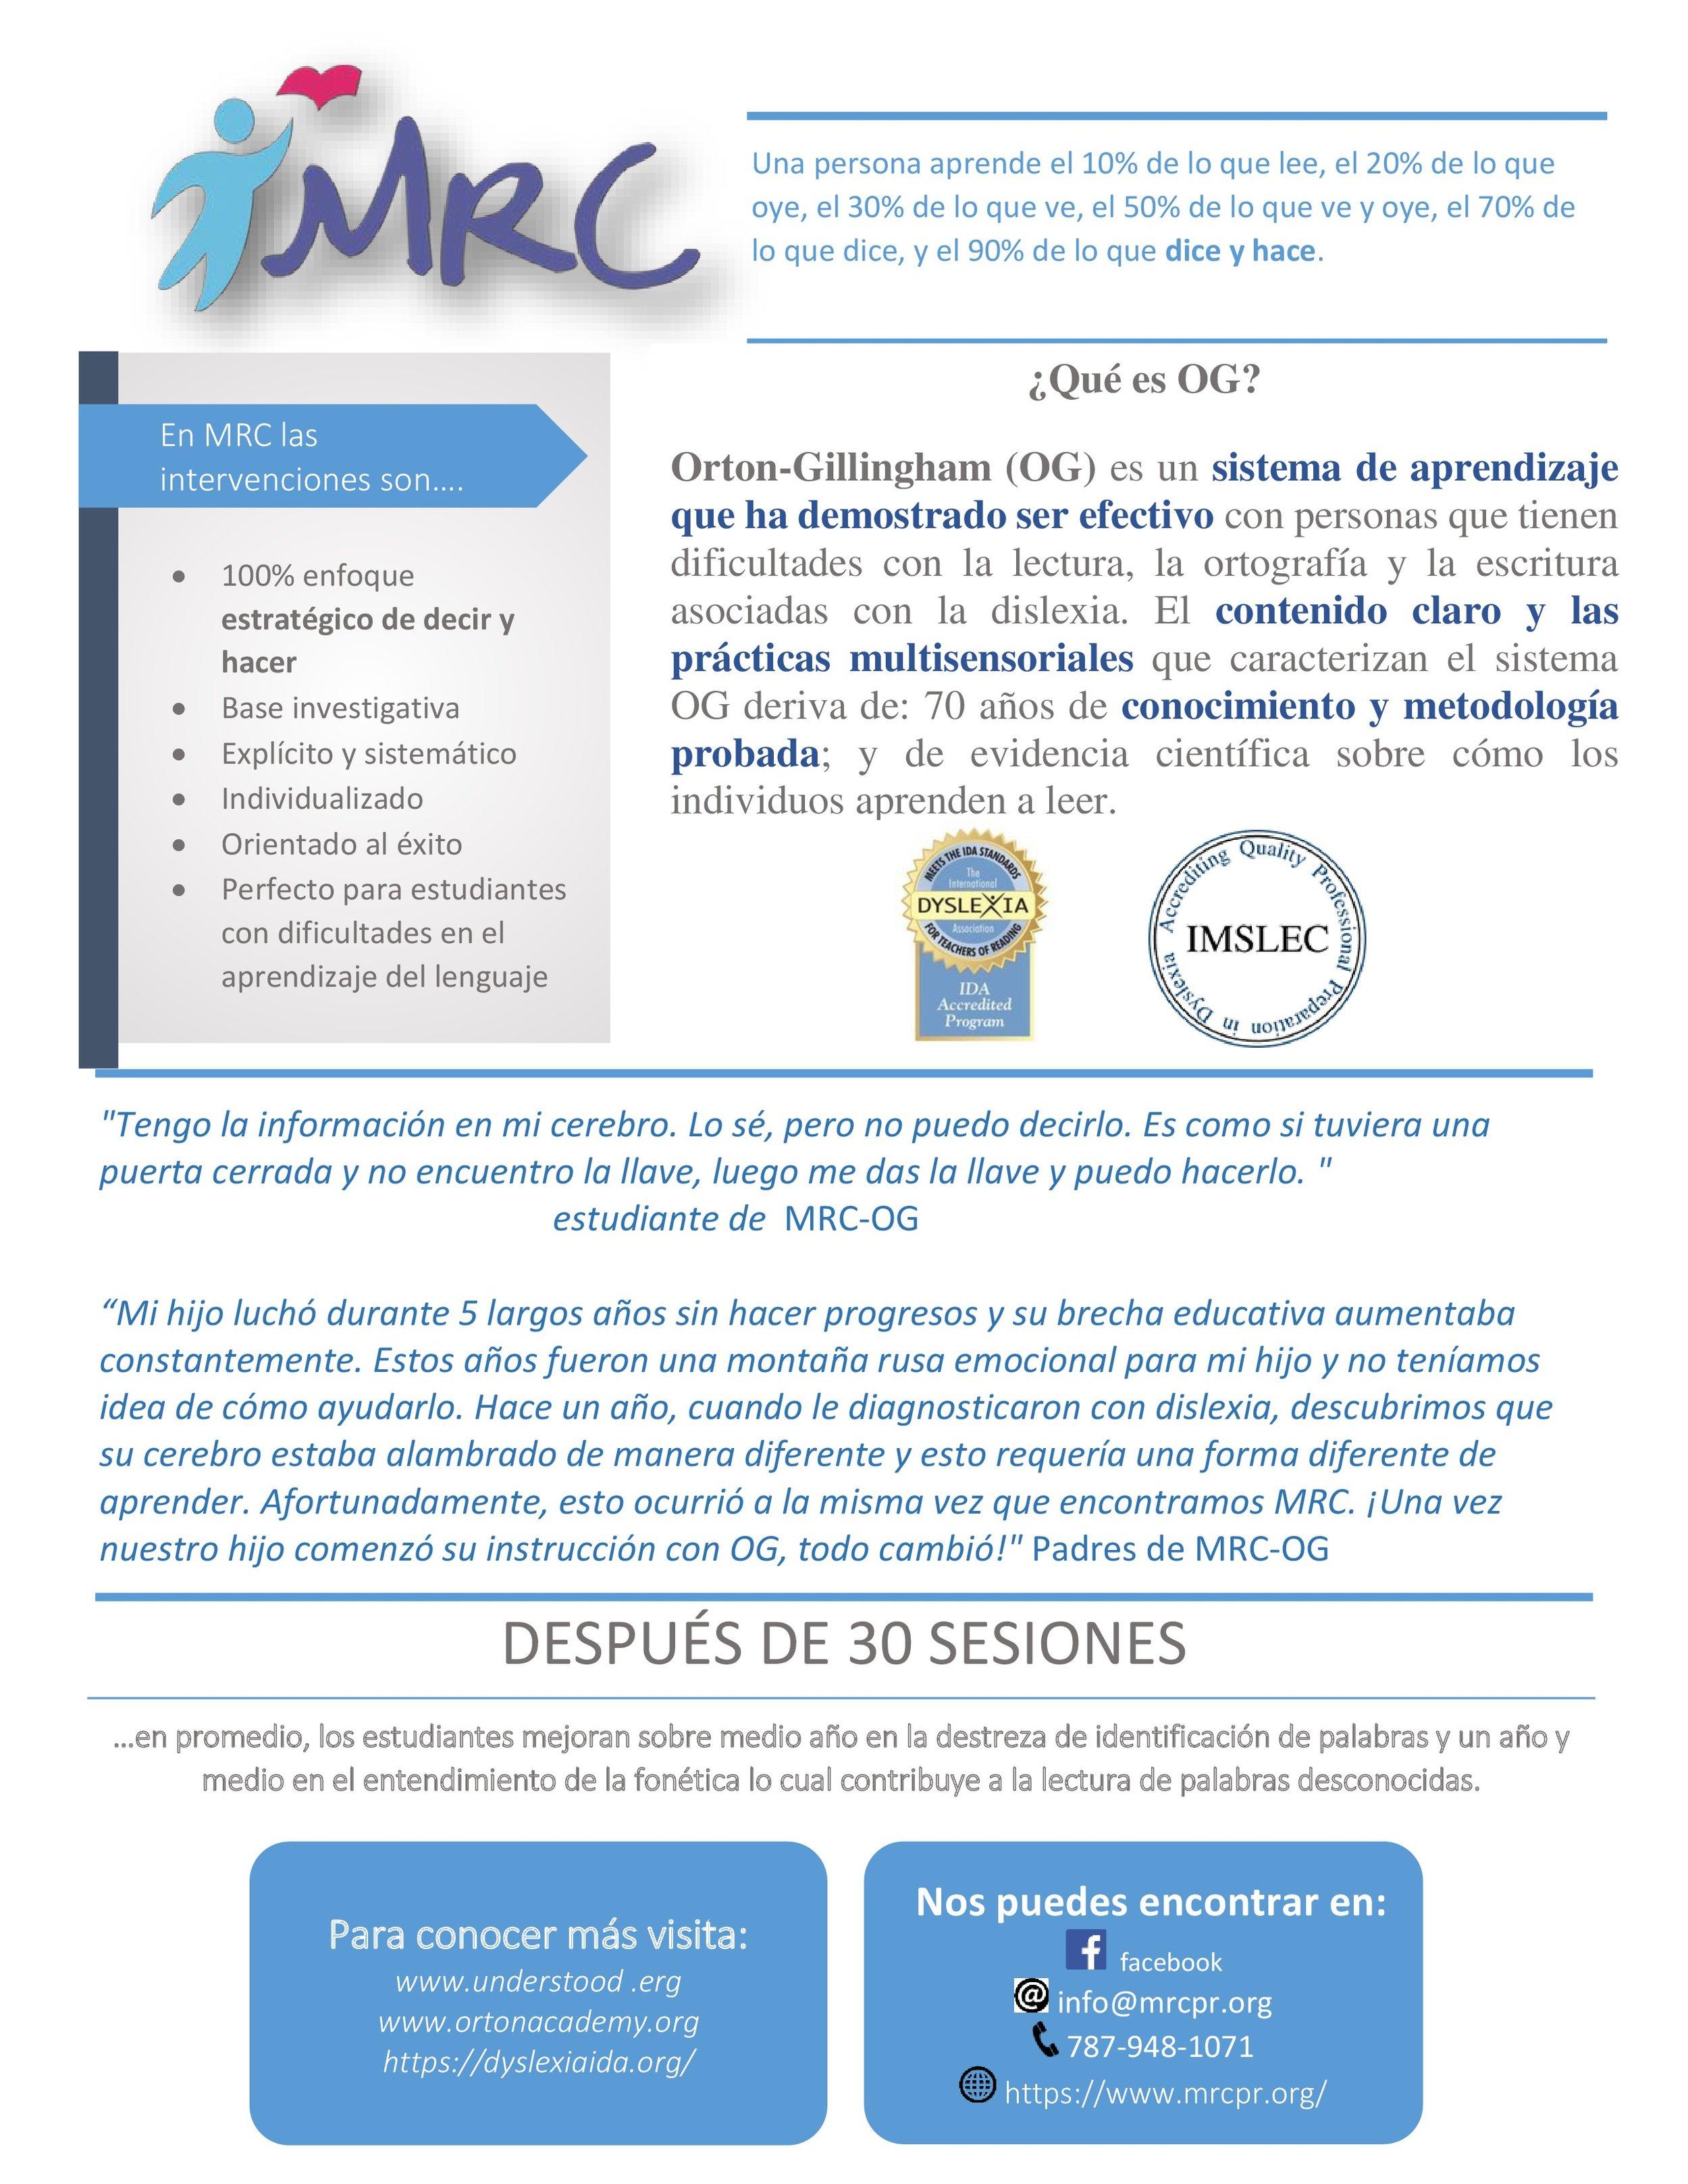 propaganda dislexia espanol_brandawarenessapr2019-page-0.jpg